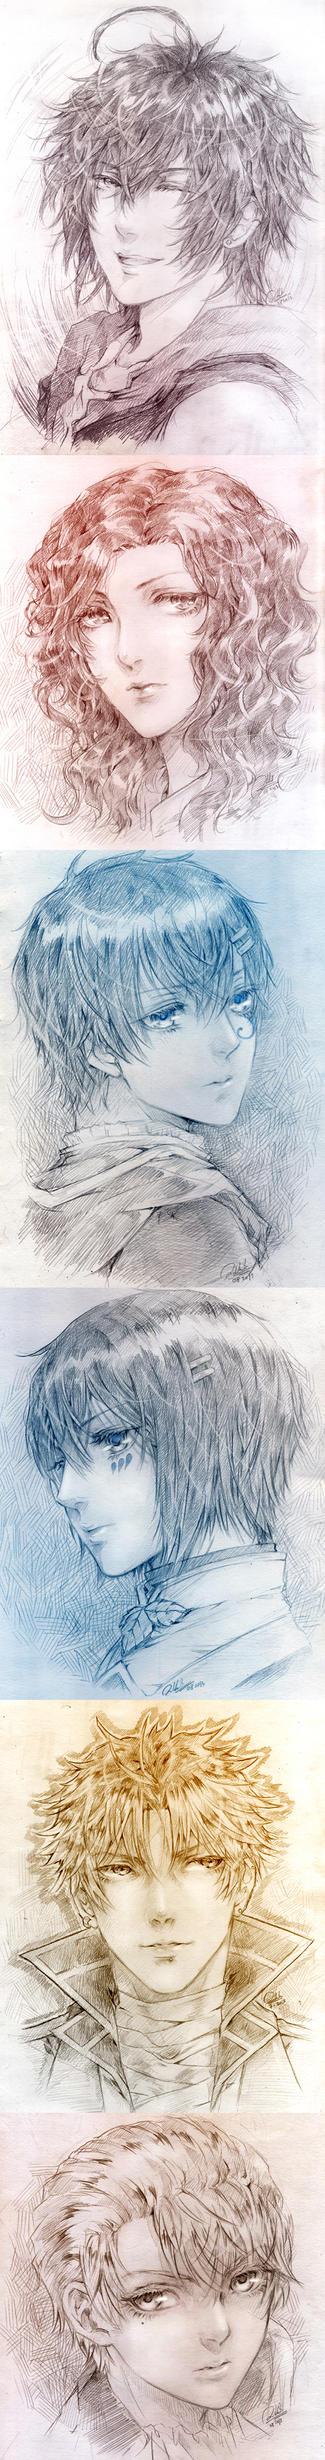 Headshot sketch by rikurikuri